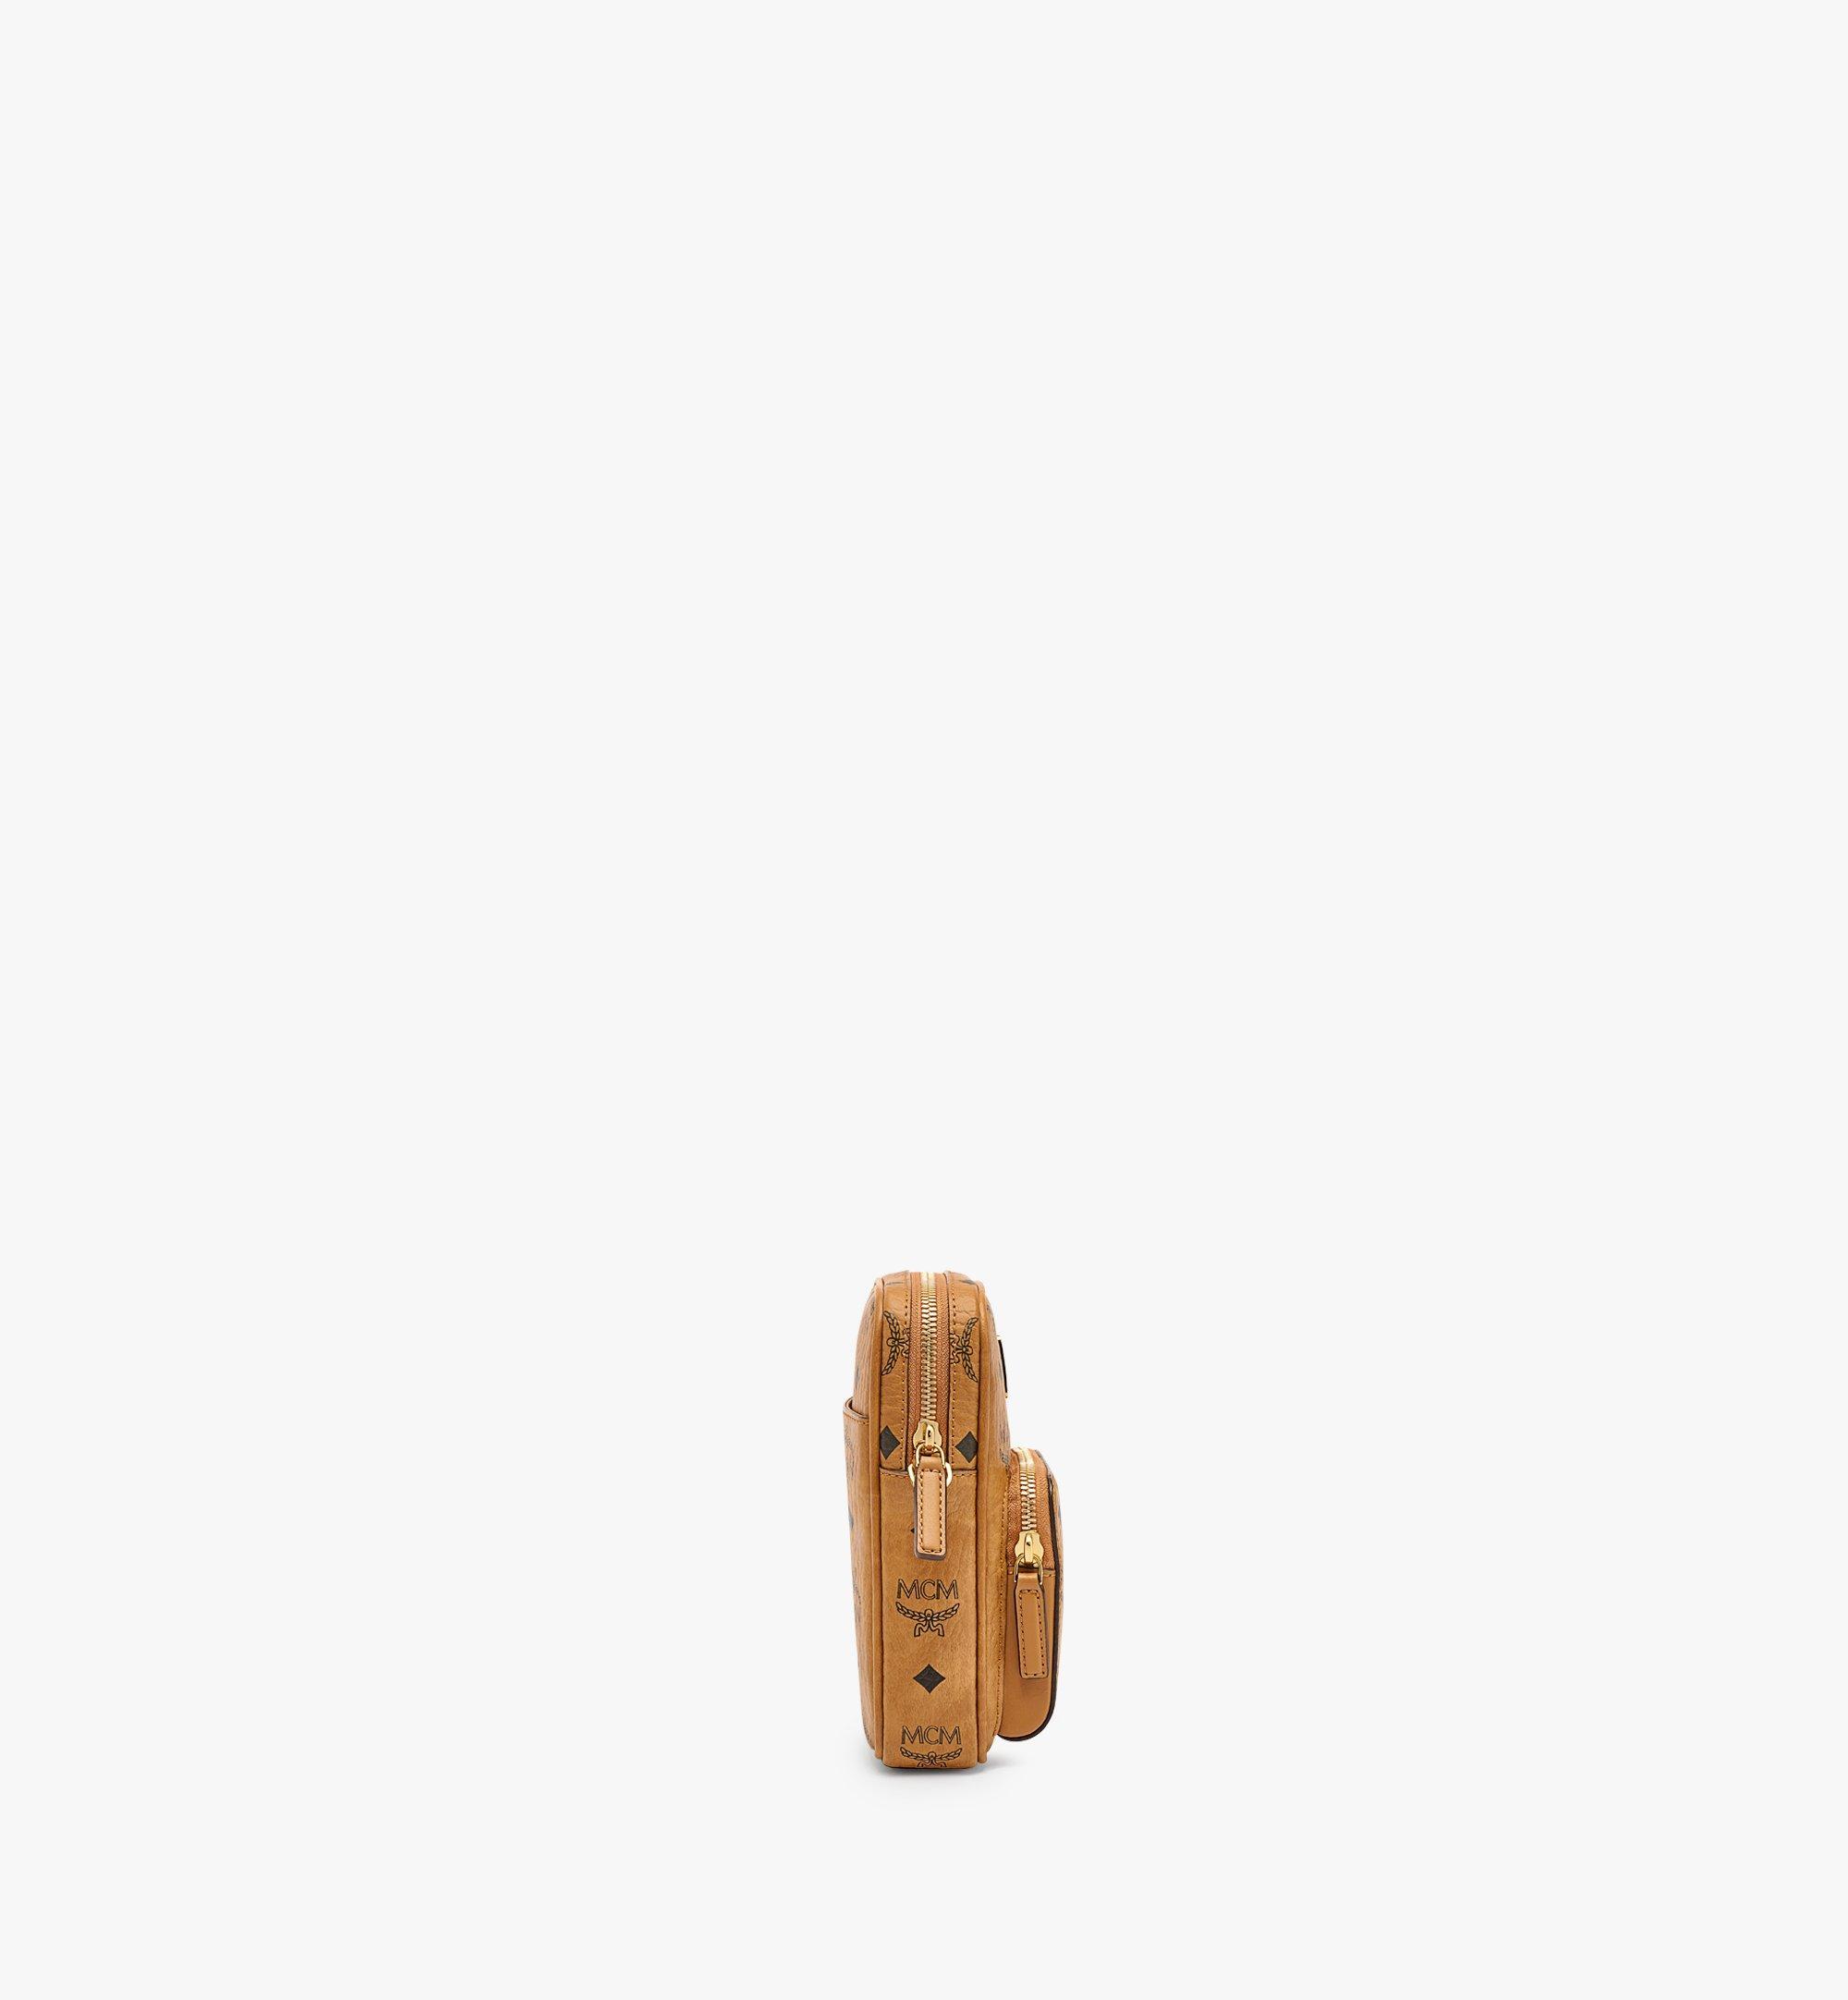 MCM N/S Crossbody Bag in Visetos Original Cognac MMRAAVI01CO001 Alternate View 1